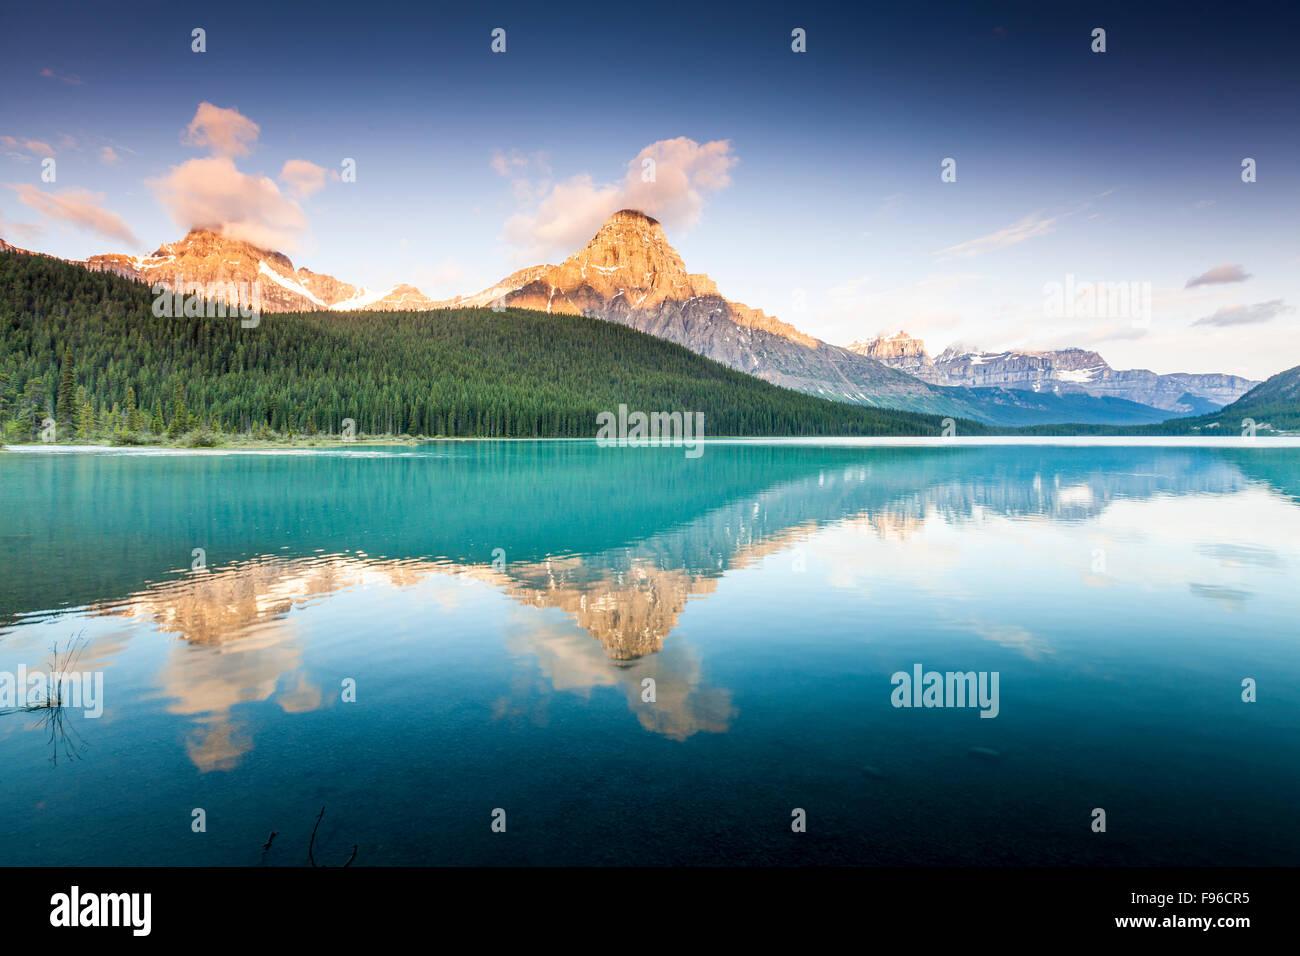 Mount Chephren reflected in lower Waterfowl Lake, Banff National Park, Alberta, Canada - Stock Image